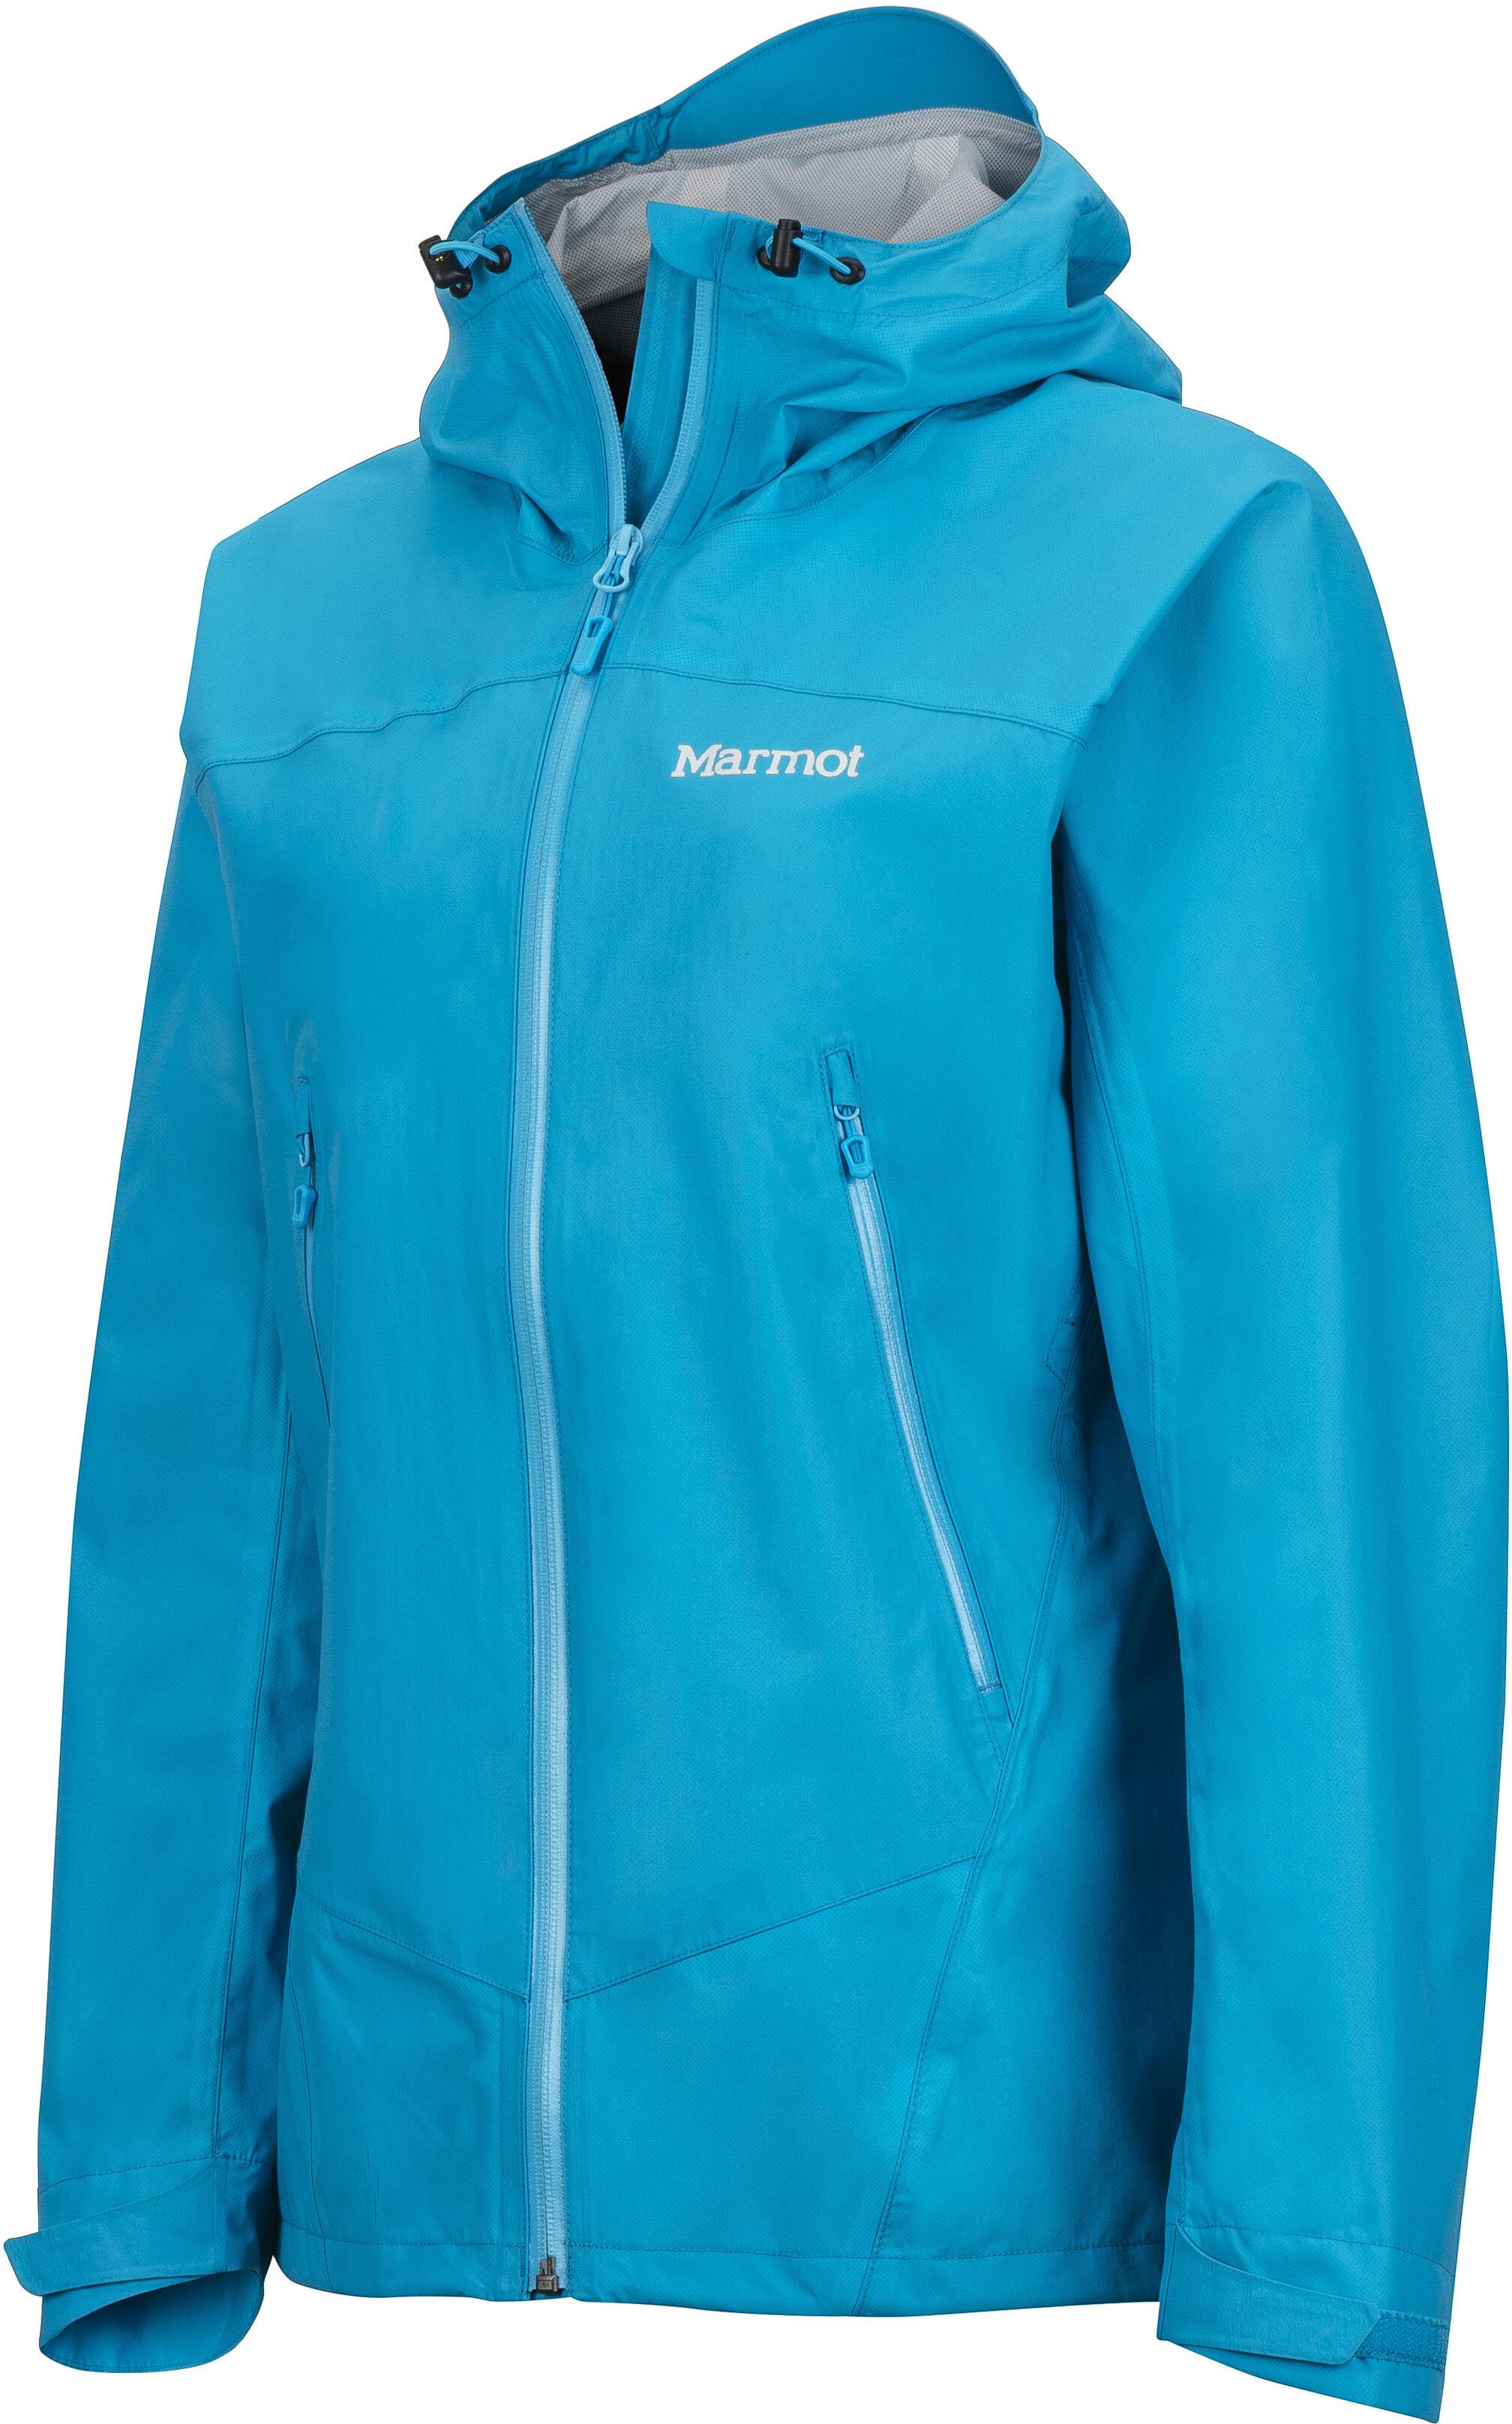 Marmot Women S Alexie Jacket: Marmot Eclipse Jacket Women Oceanic